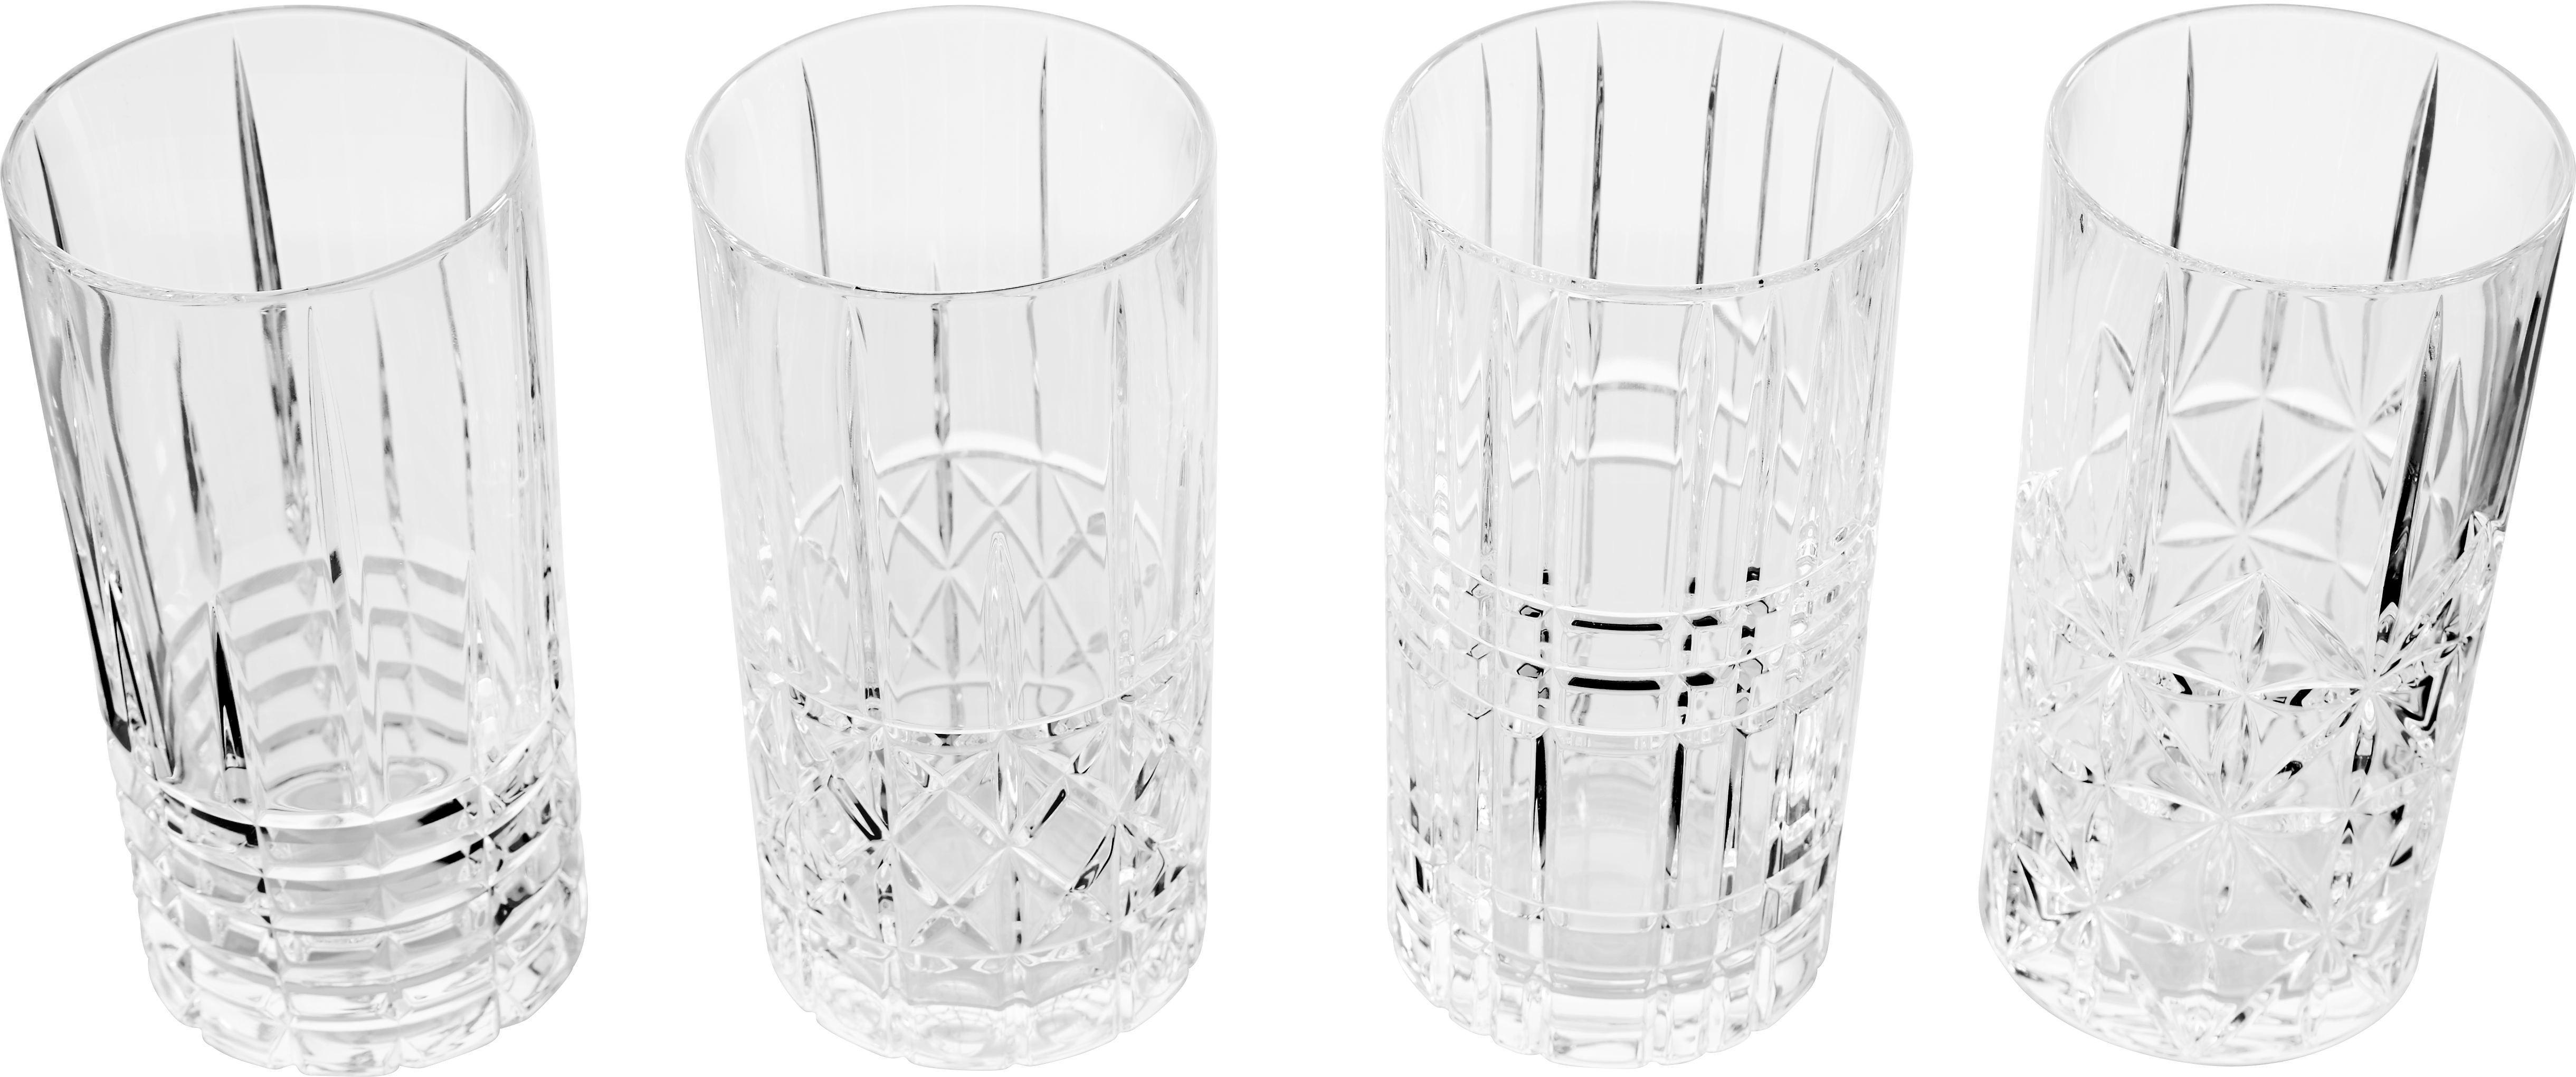 Longdrinkgläser Nachtmann Highland 4-er Set - Klar, KONVENTIONELL, Glas (15,1cm) - NACHTMANN